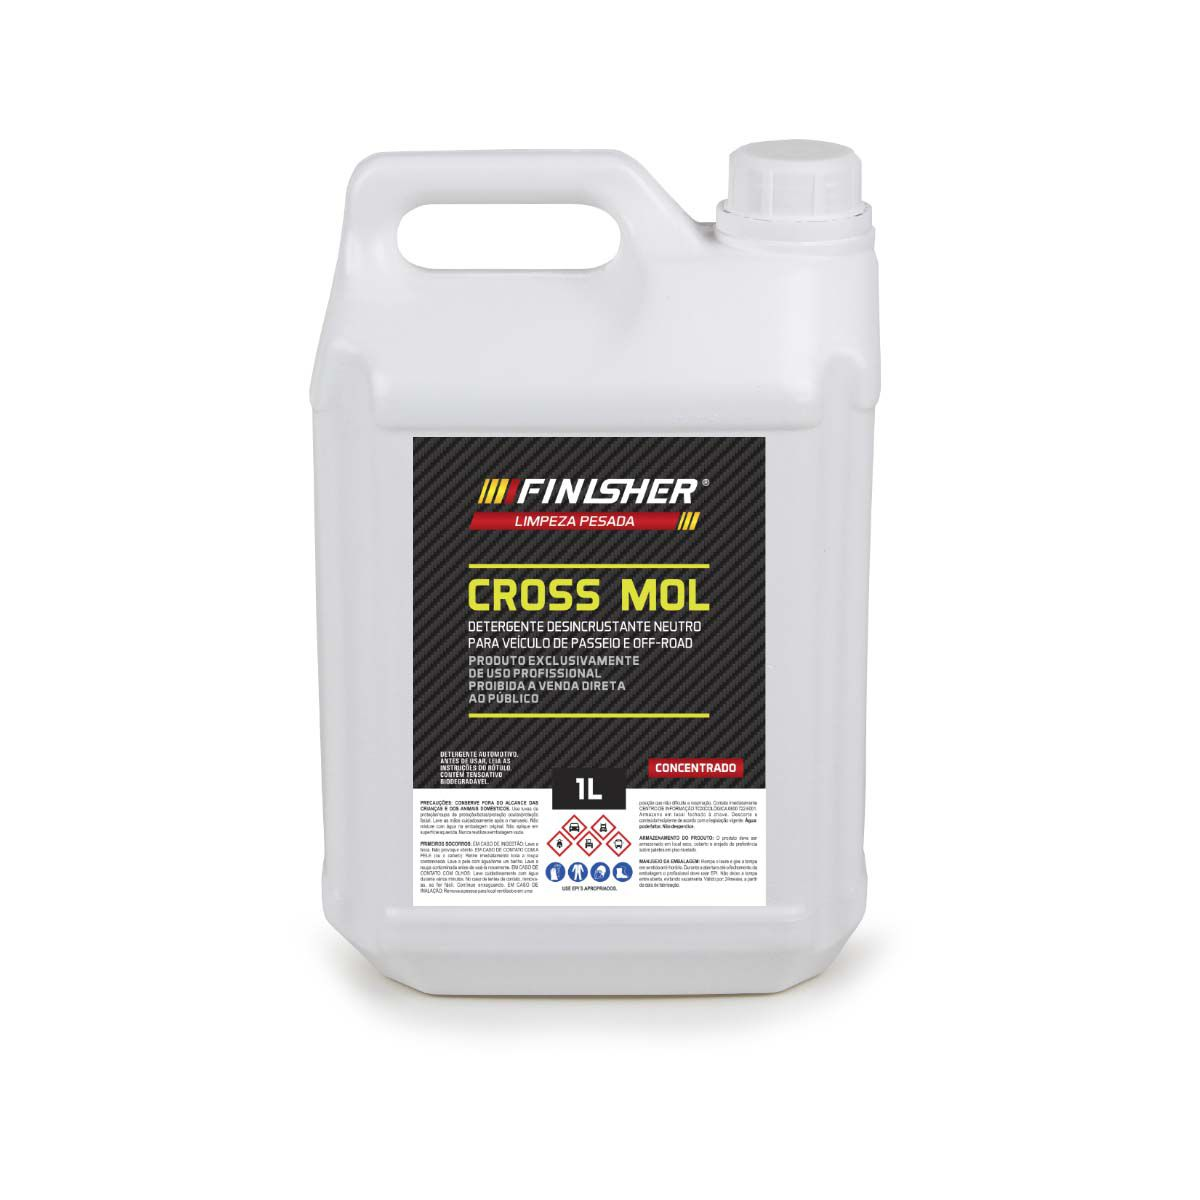 Cross Mol Shampoo Desengraxante 5 Litros Finisher